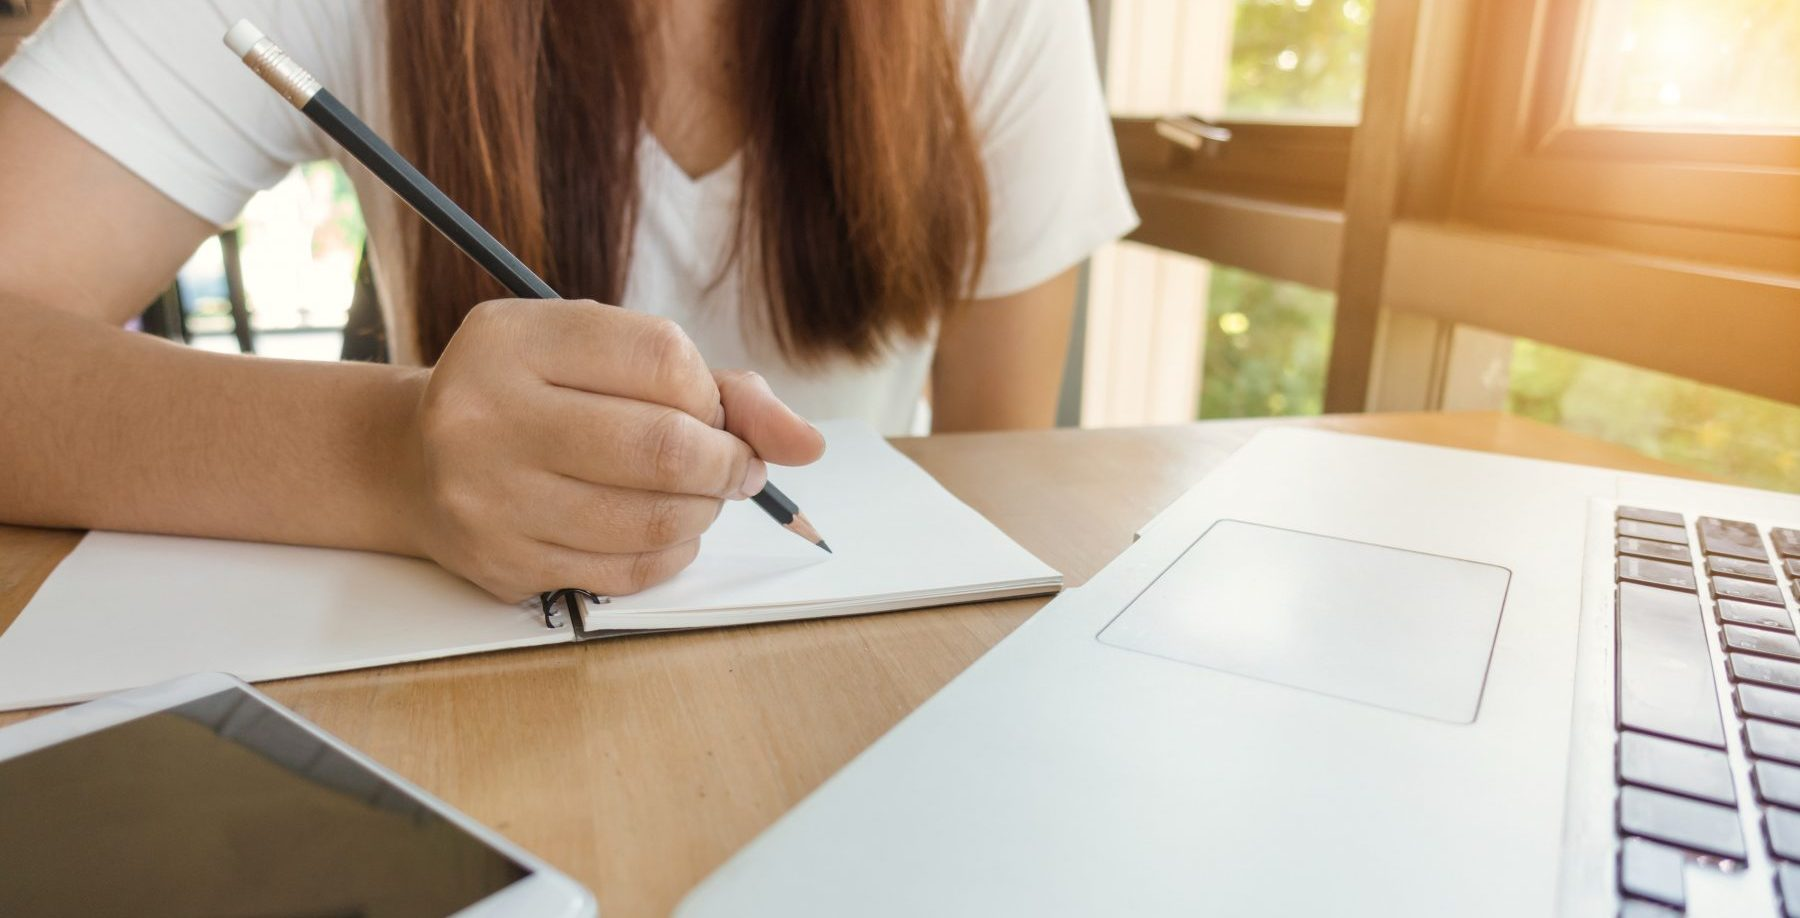 Essay socratespost.com admissions insiders insights